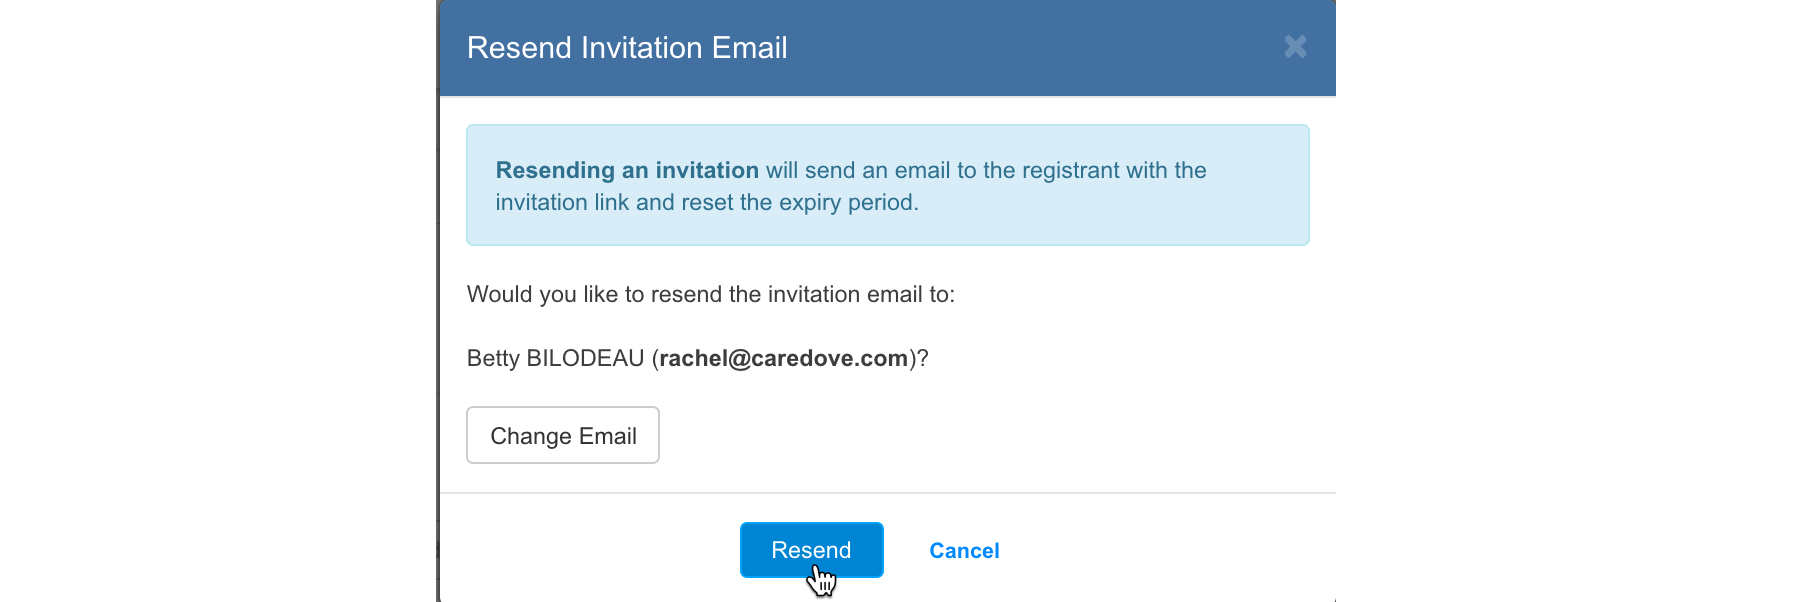 Resend Invitation Email button